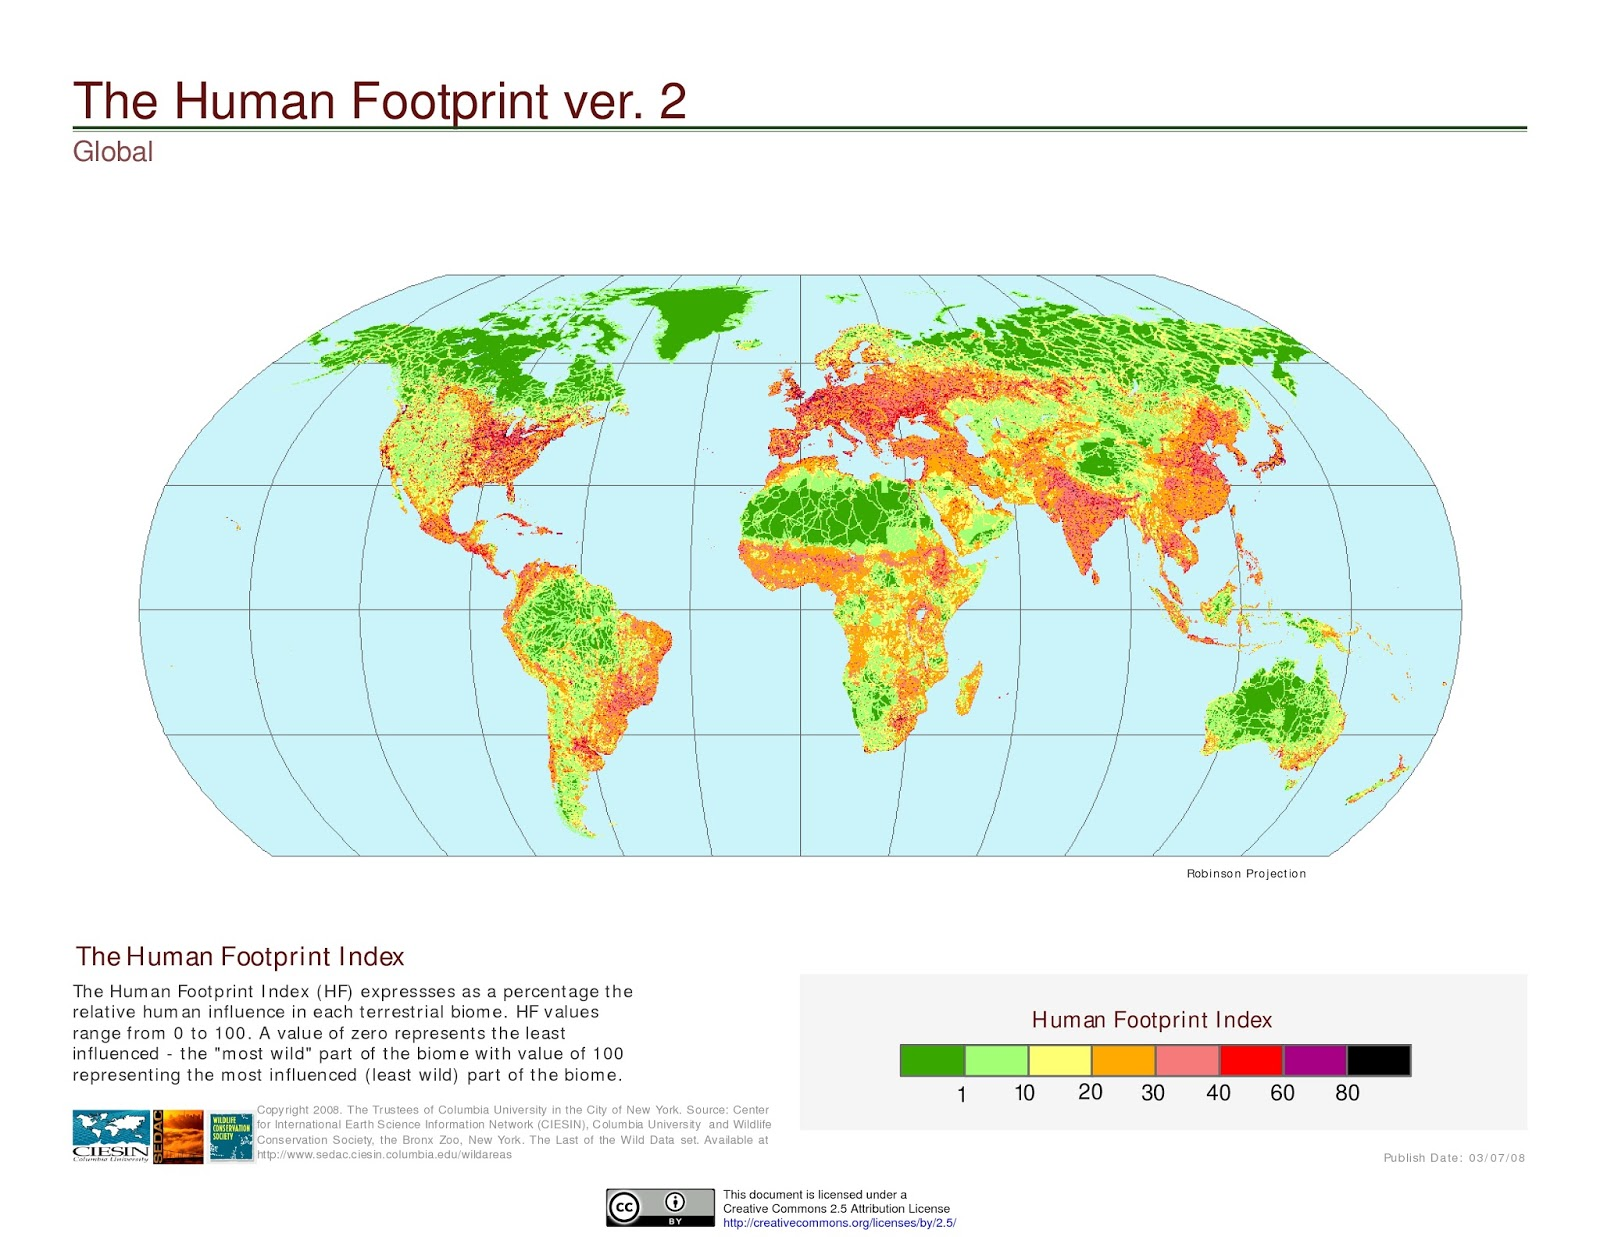 The Human Footprint Index